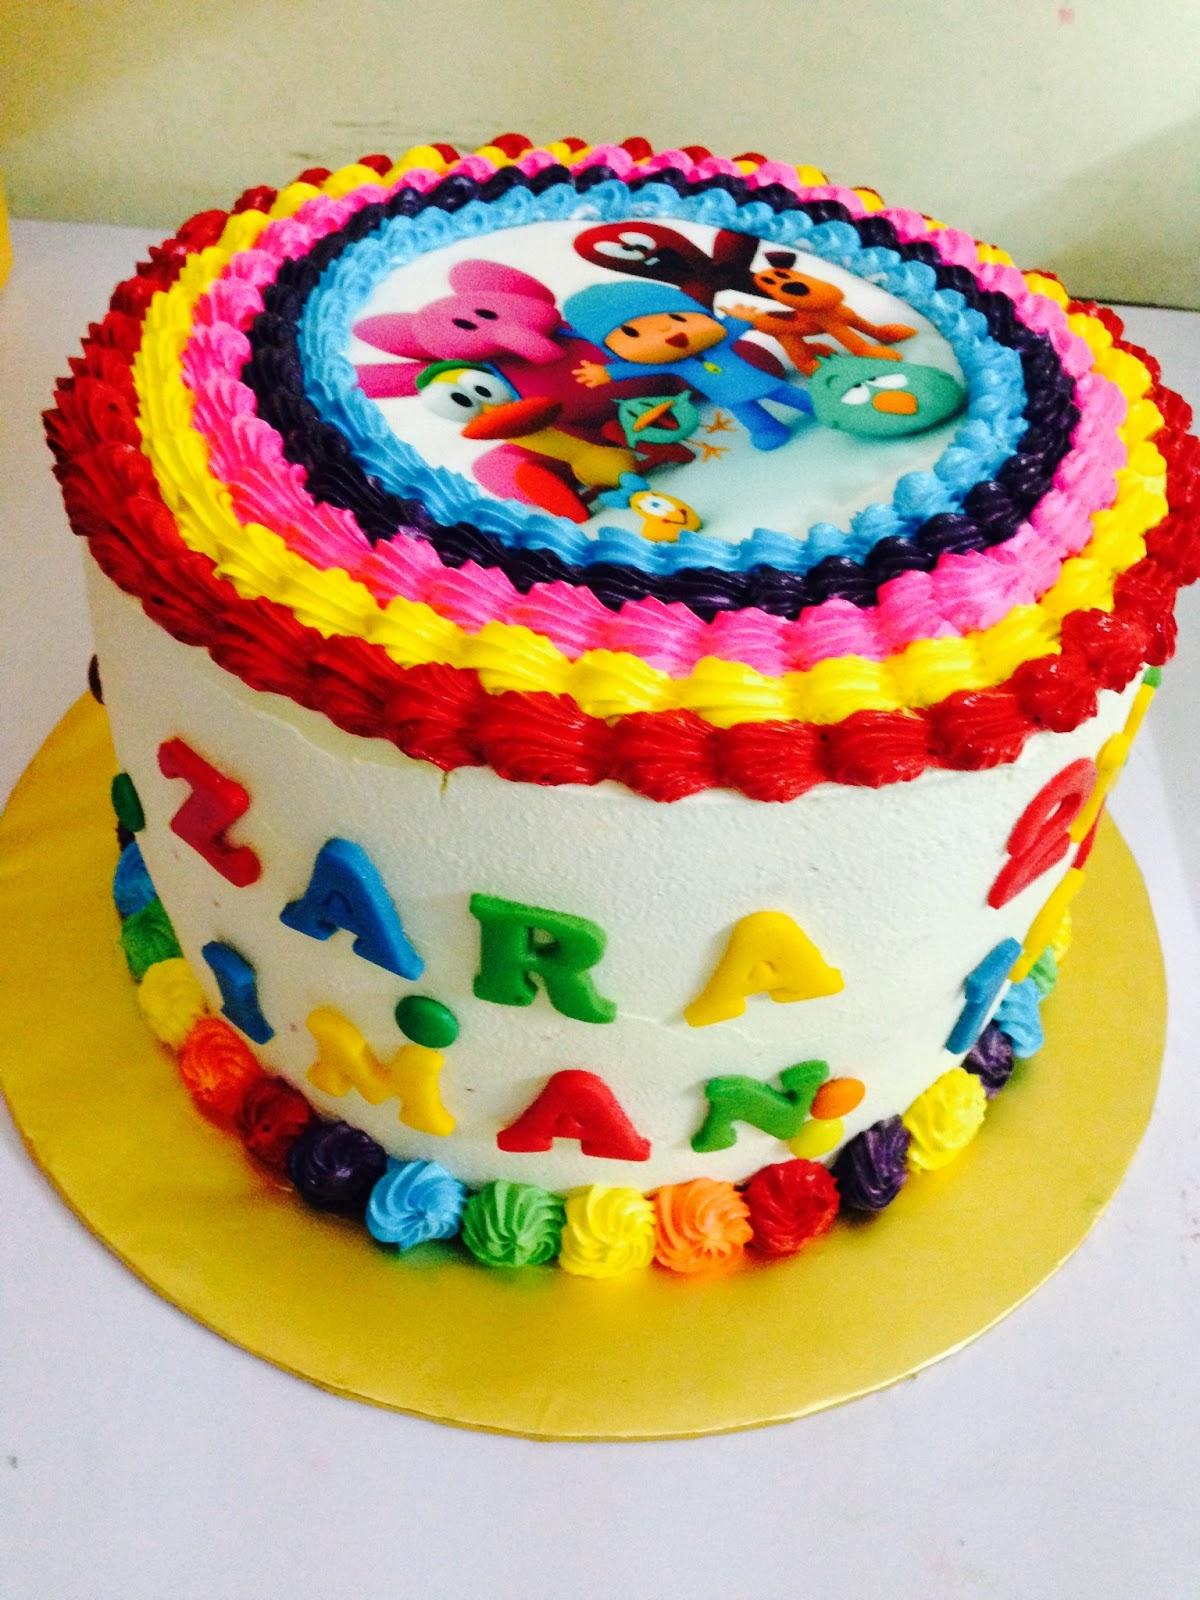 ninie cakes house: Paroro and Rainbow Design